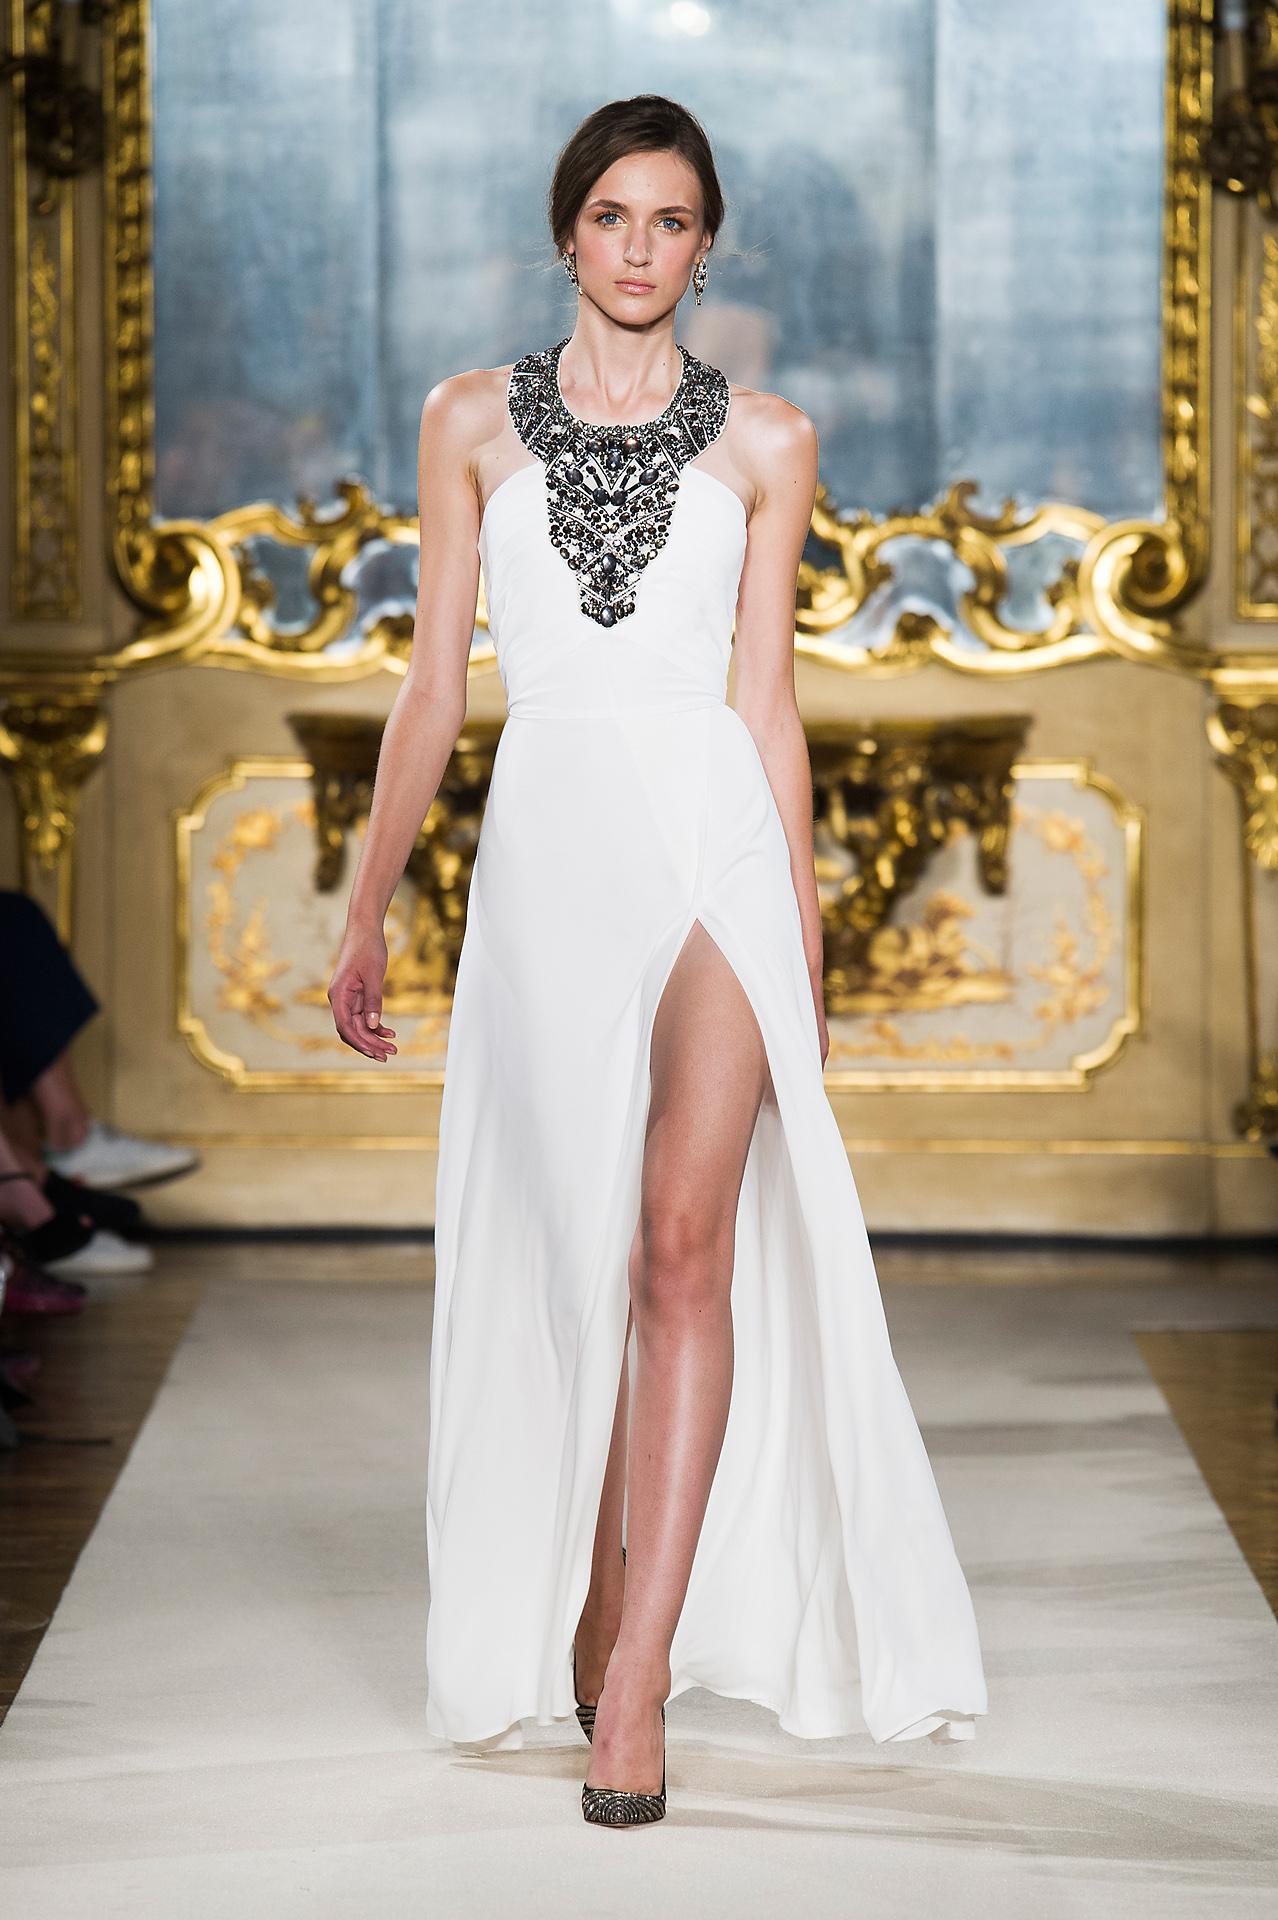 ee5f92fa23 Elisabetta Franchi Spring-Summer 2015 Fashion Show: the Looks ...